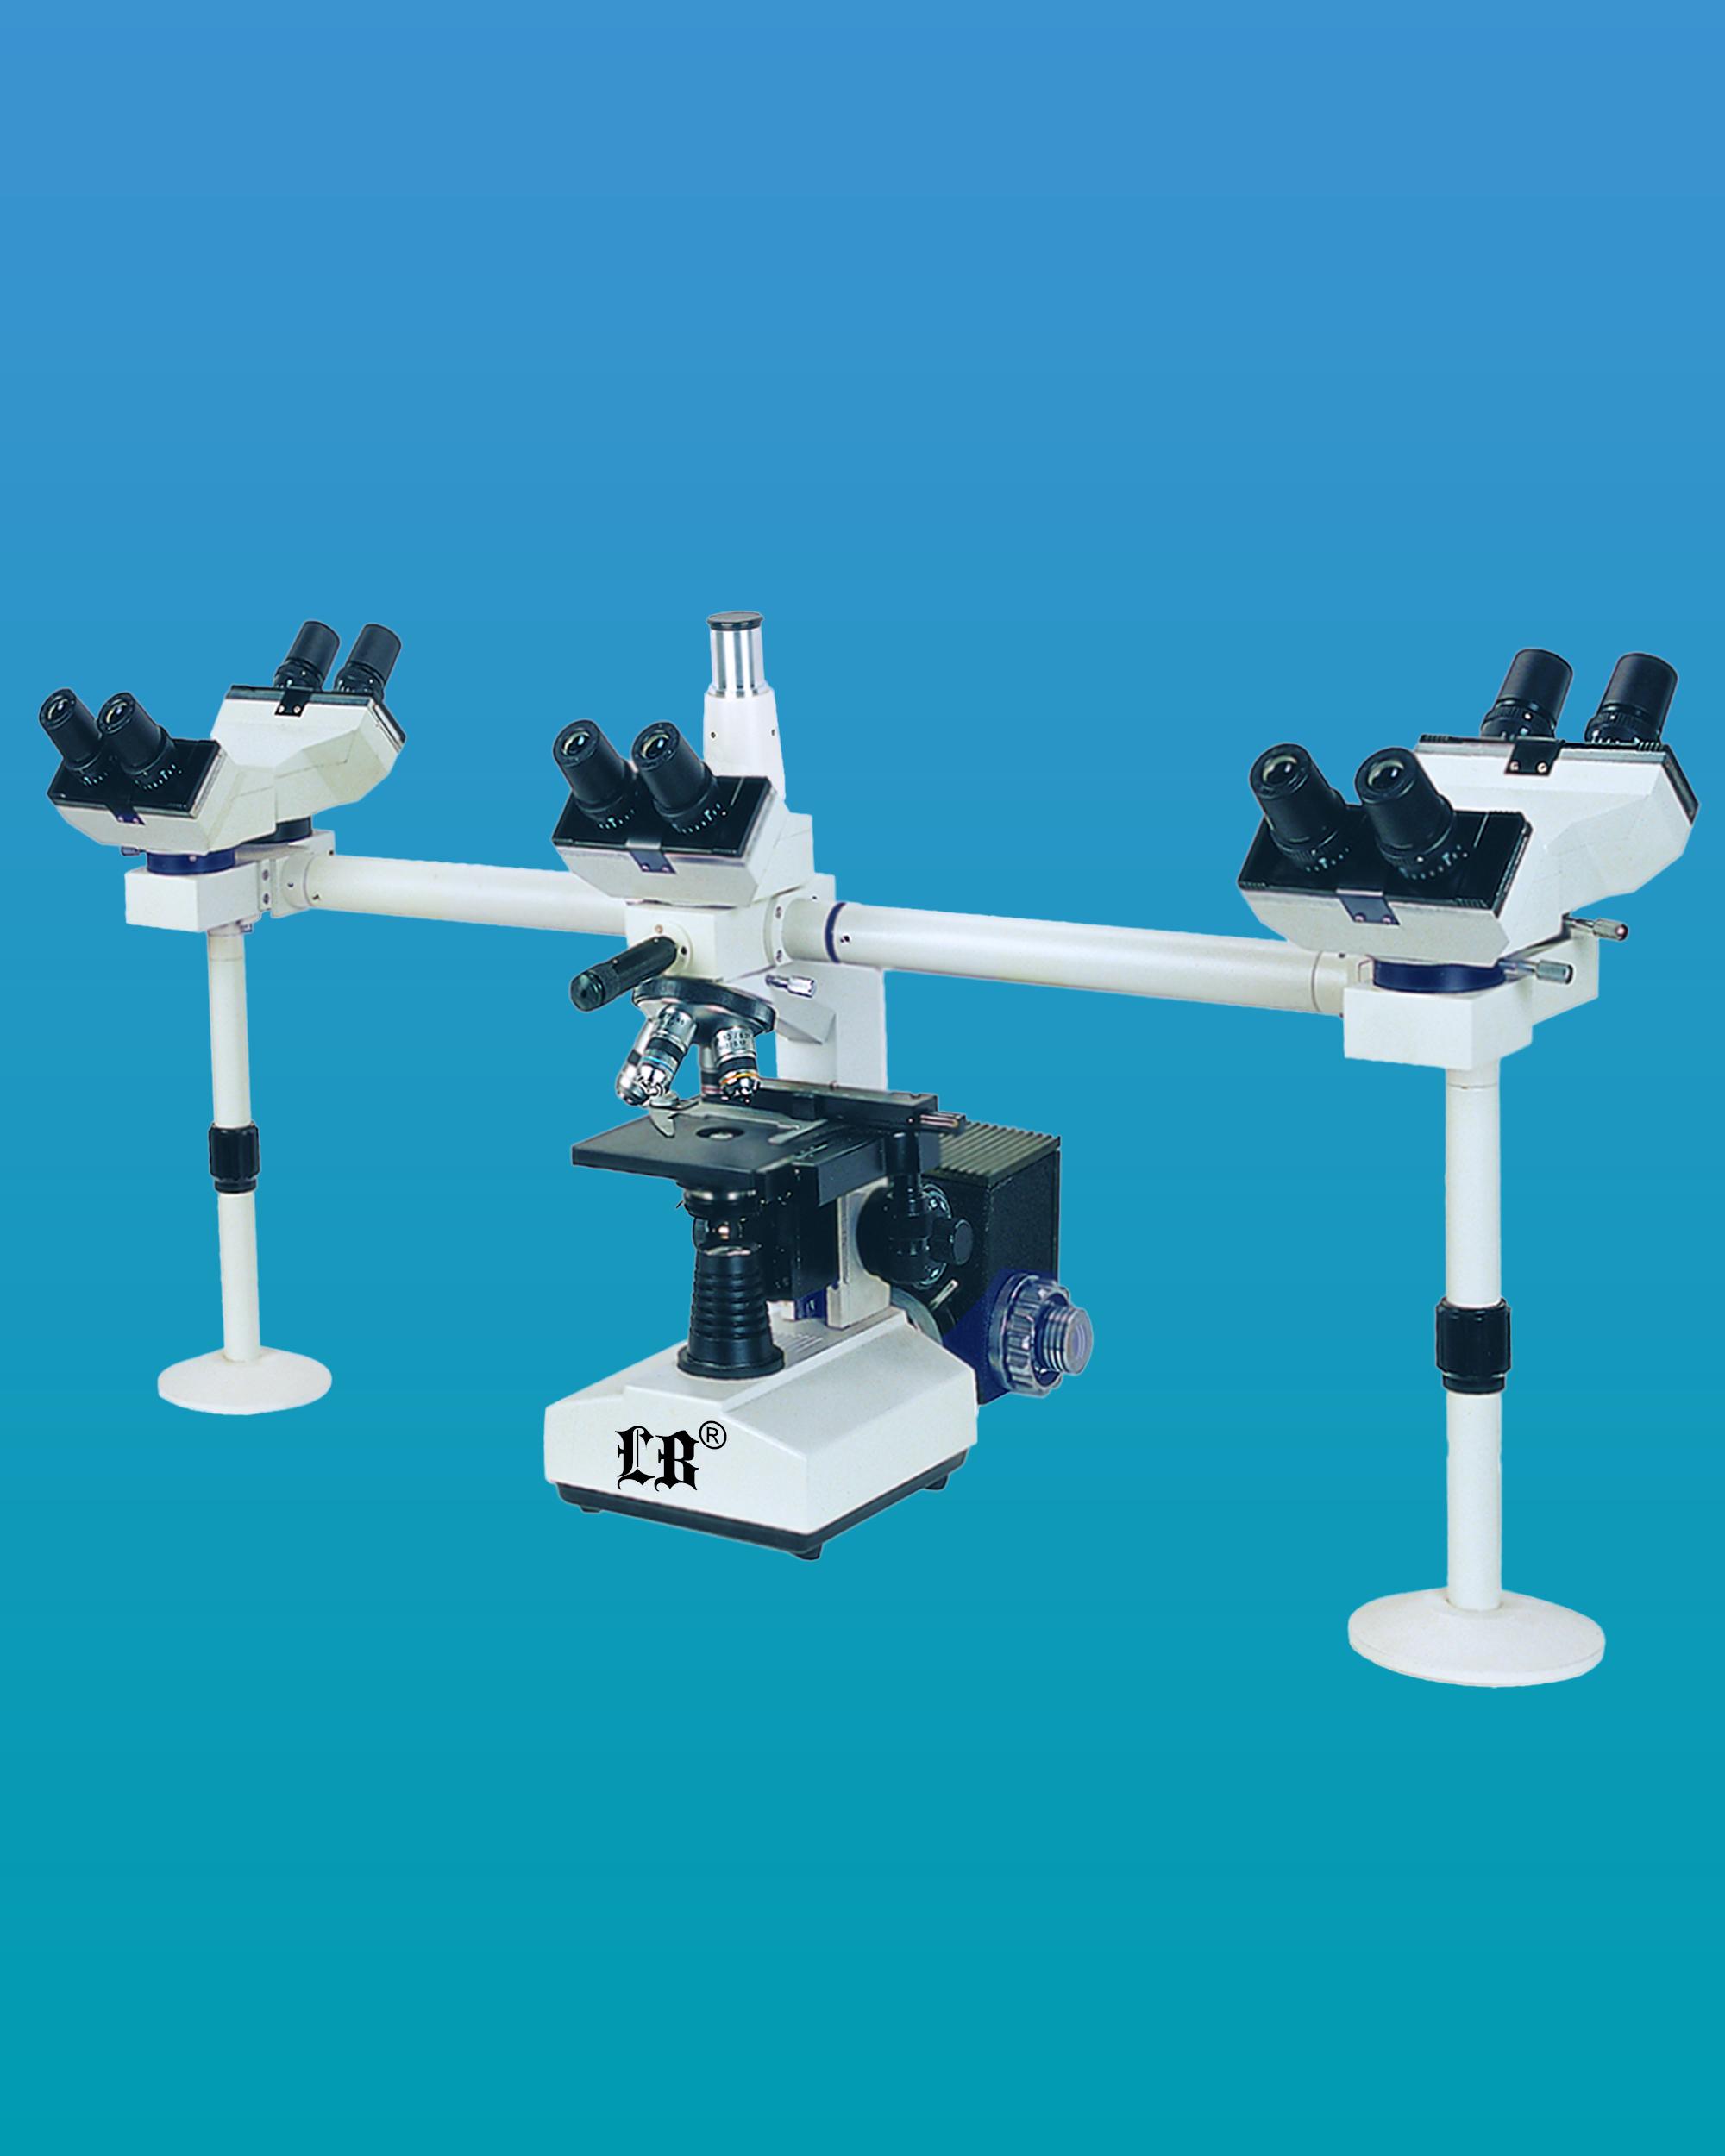 [LB-982] Multi-Head Microscope w/ Trinocular Head